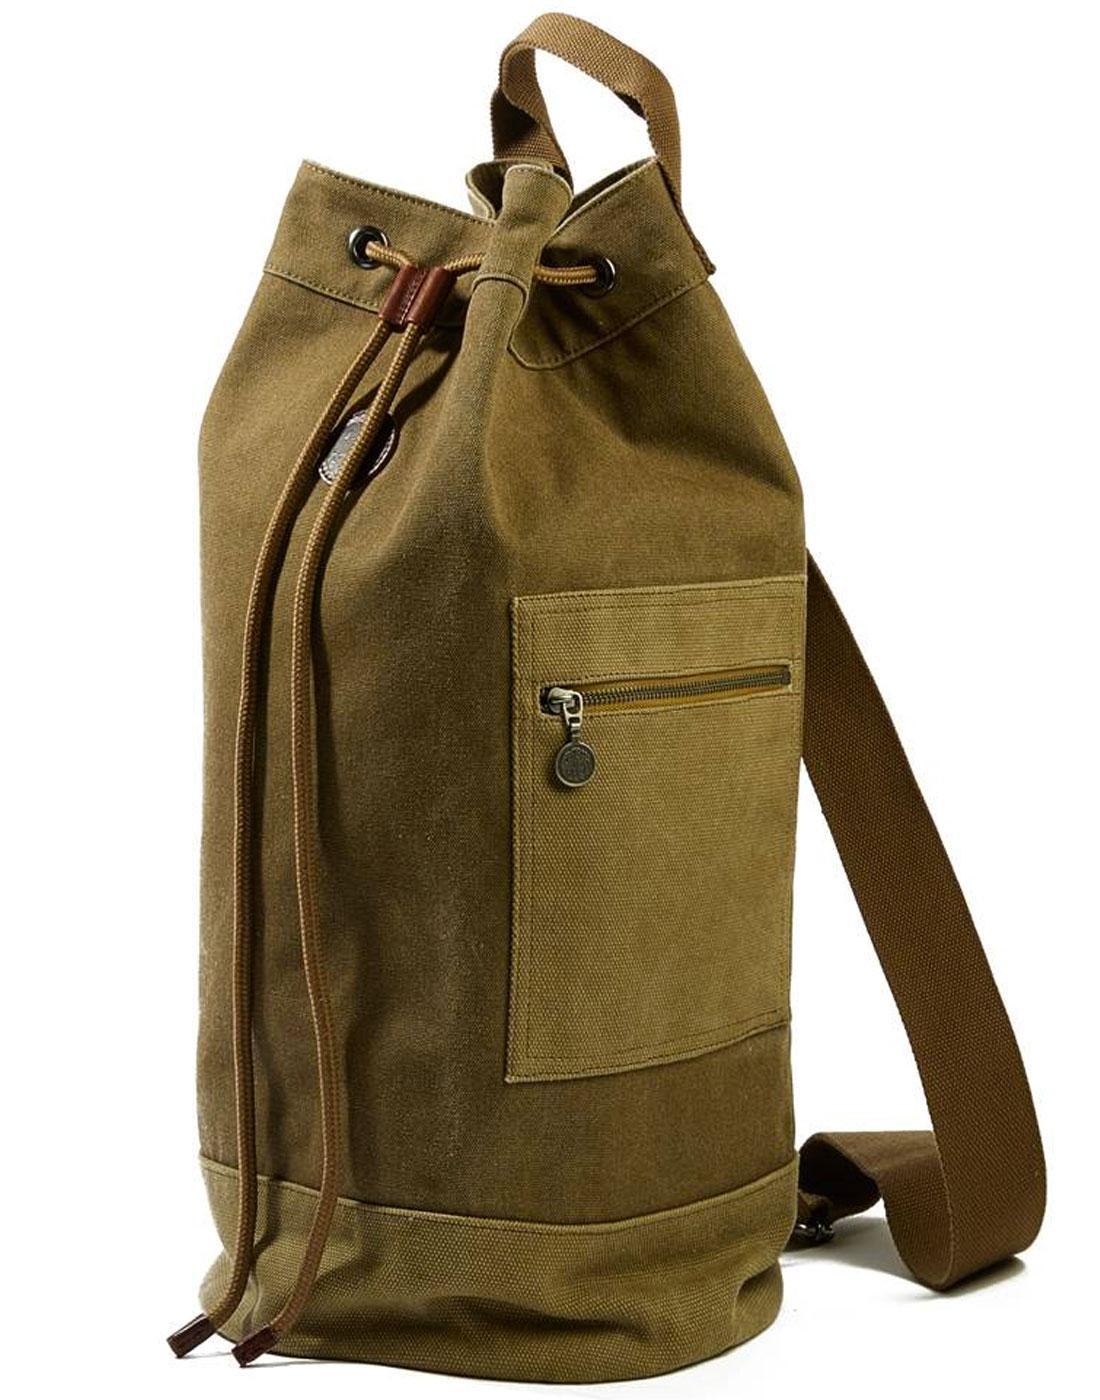 PRETTY GREEN Retro 70s Military Canvas Duffle Bag